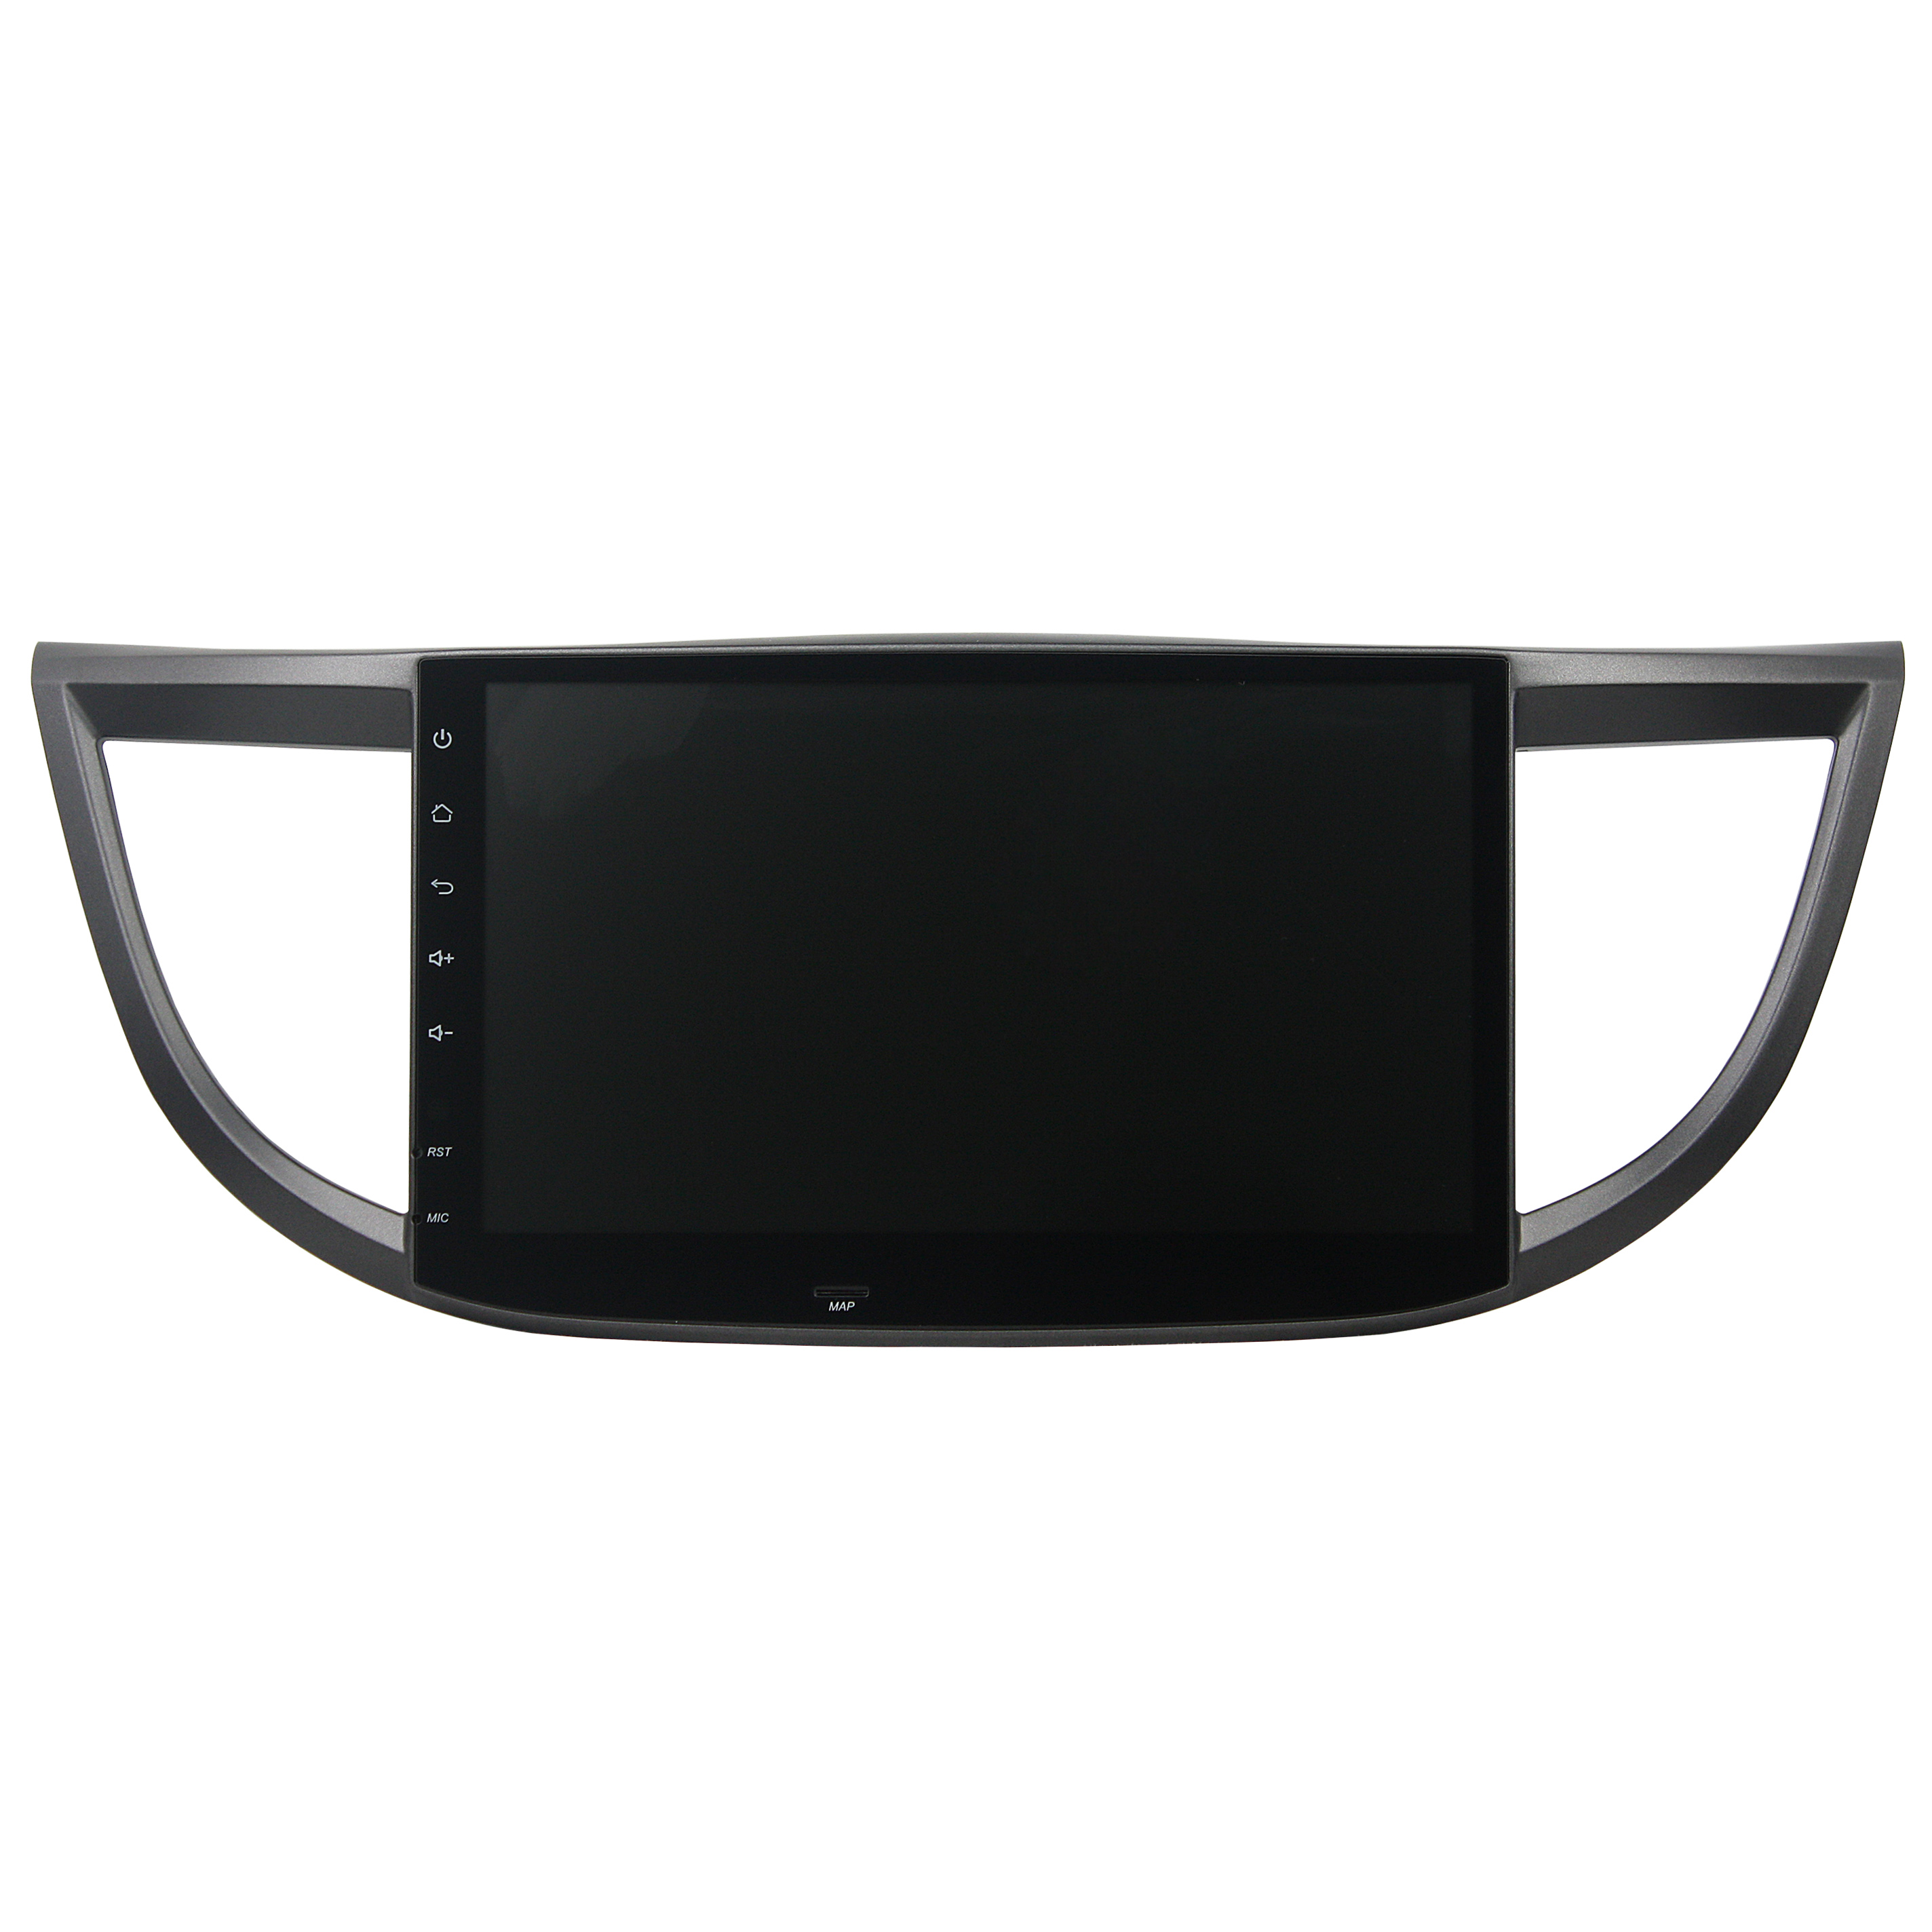 Фото - Штатная магнитола CARMEDIA KD-1050 DVD Honda CRV IV 2012-2015 (RM) chunghop rm l7 multifunctional learning remote control silver